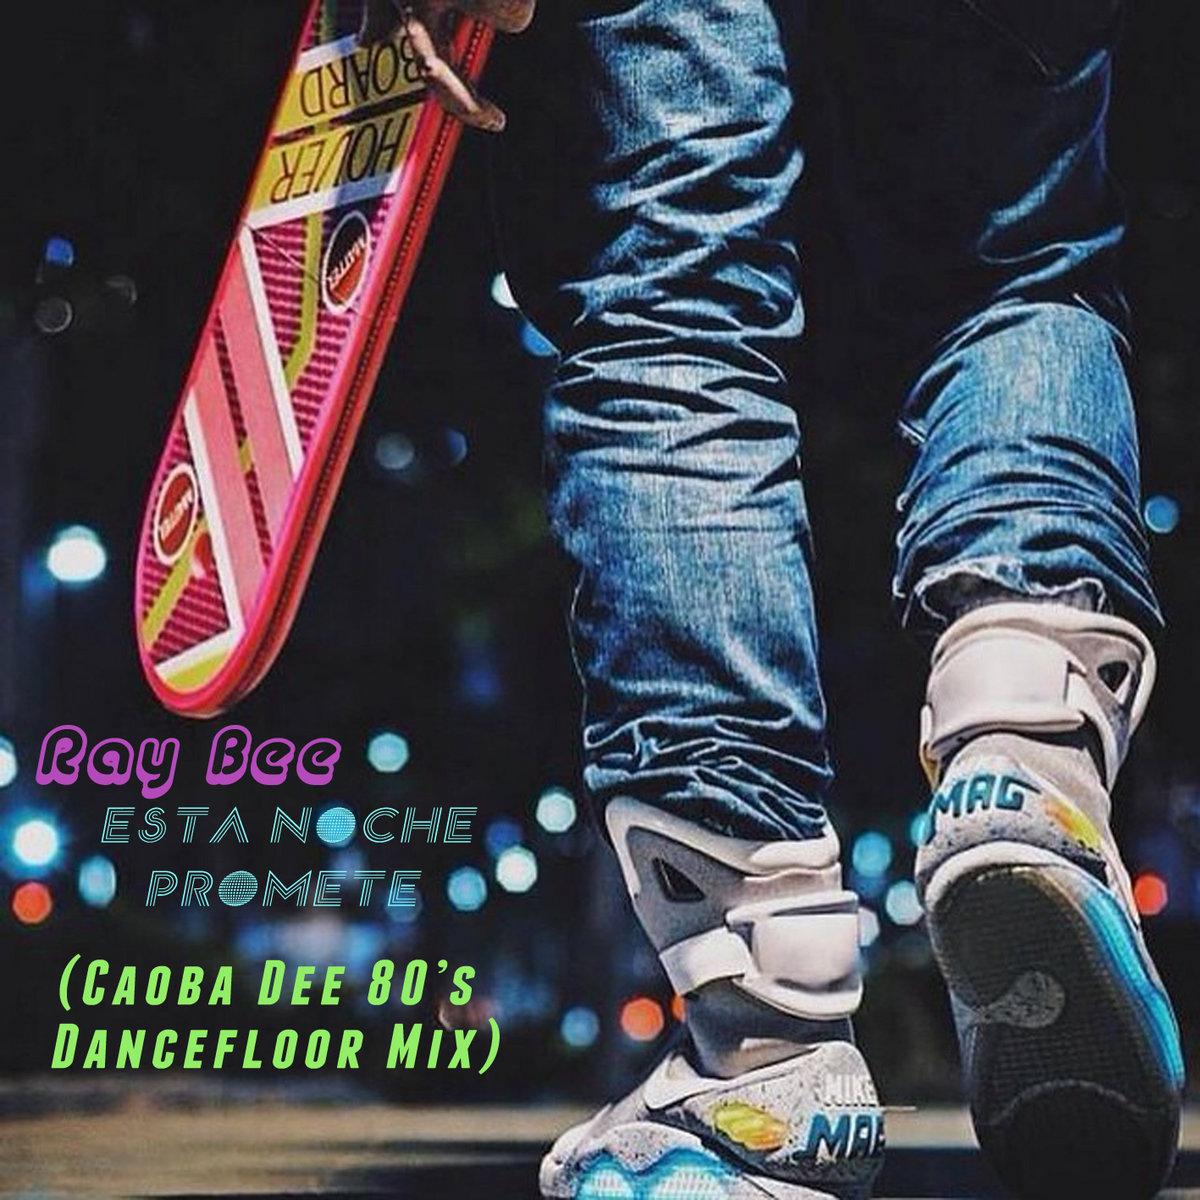 Ray Bee - Esta Noche Promete (Caoba Dee 80's Dance Floor Mix